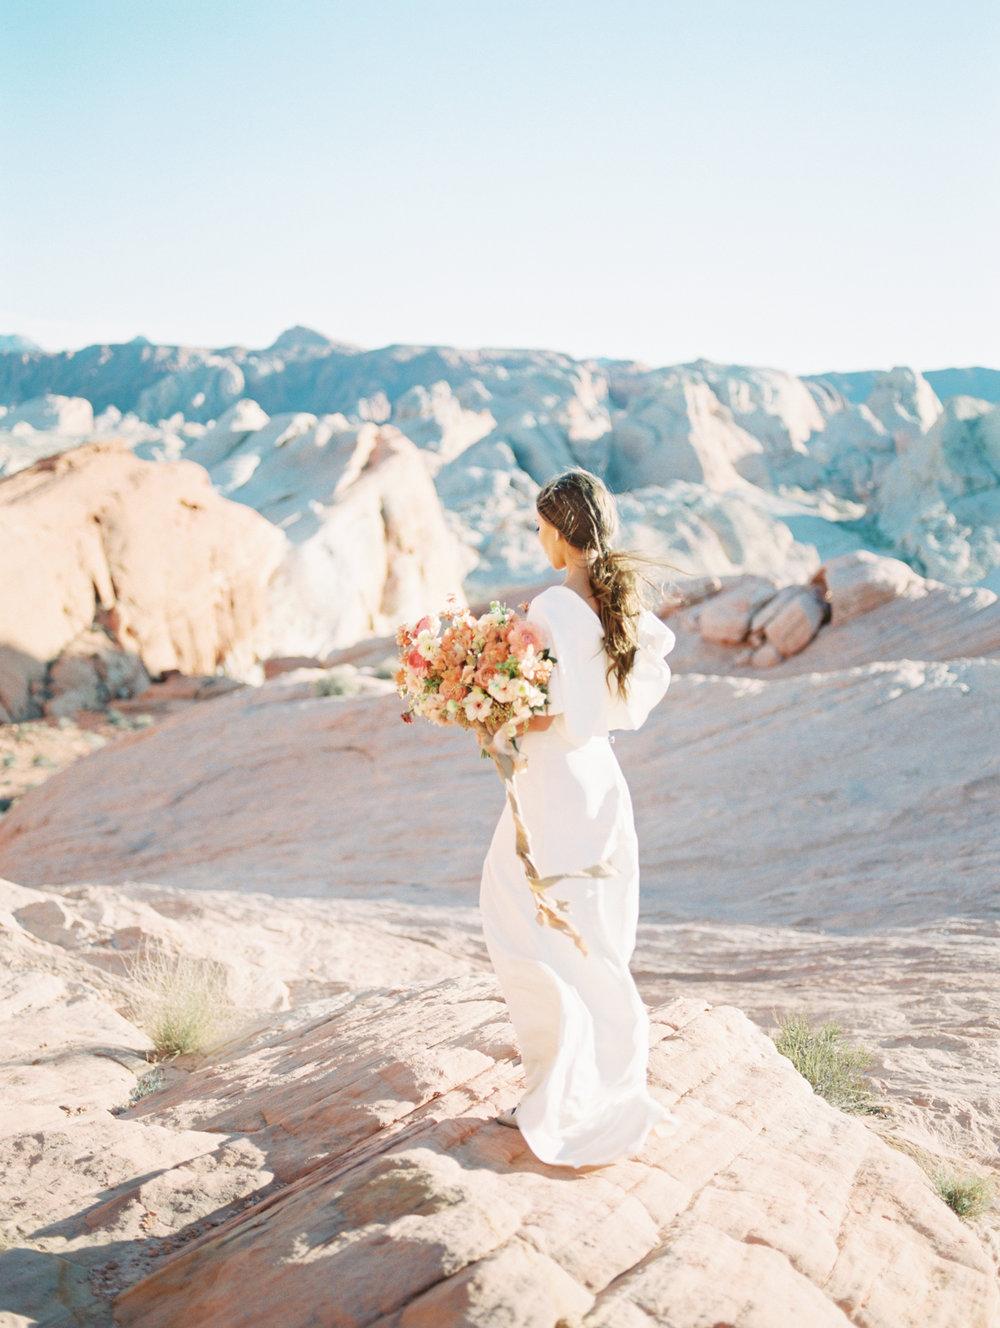 AKP_Desert_Wedding_Bridal_Shoot_Film_Fine_Art_Wedding_Photographer_Los_Angeles-10.jpg